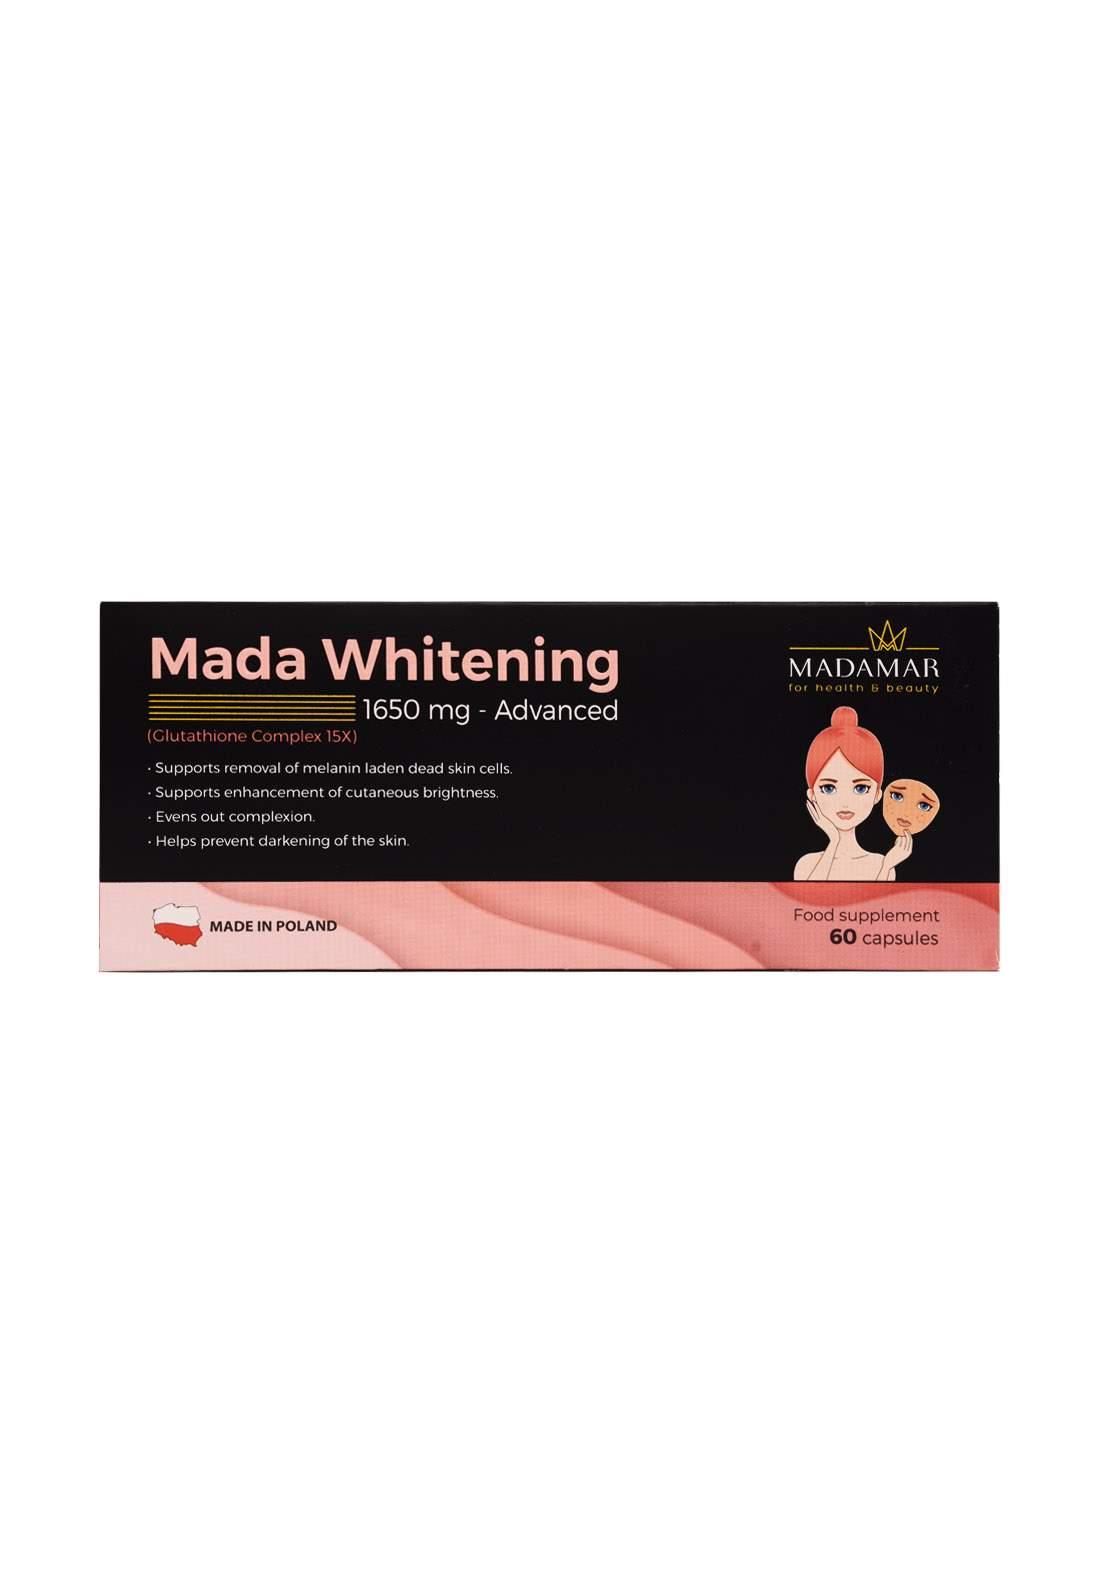 Madamar Mada Whitening 1650mg -Advanced 60 capsules  مكمل غذائي